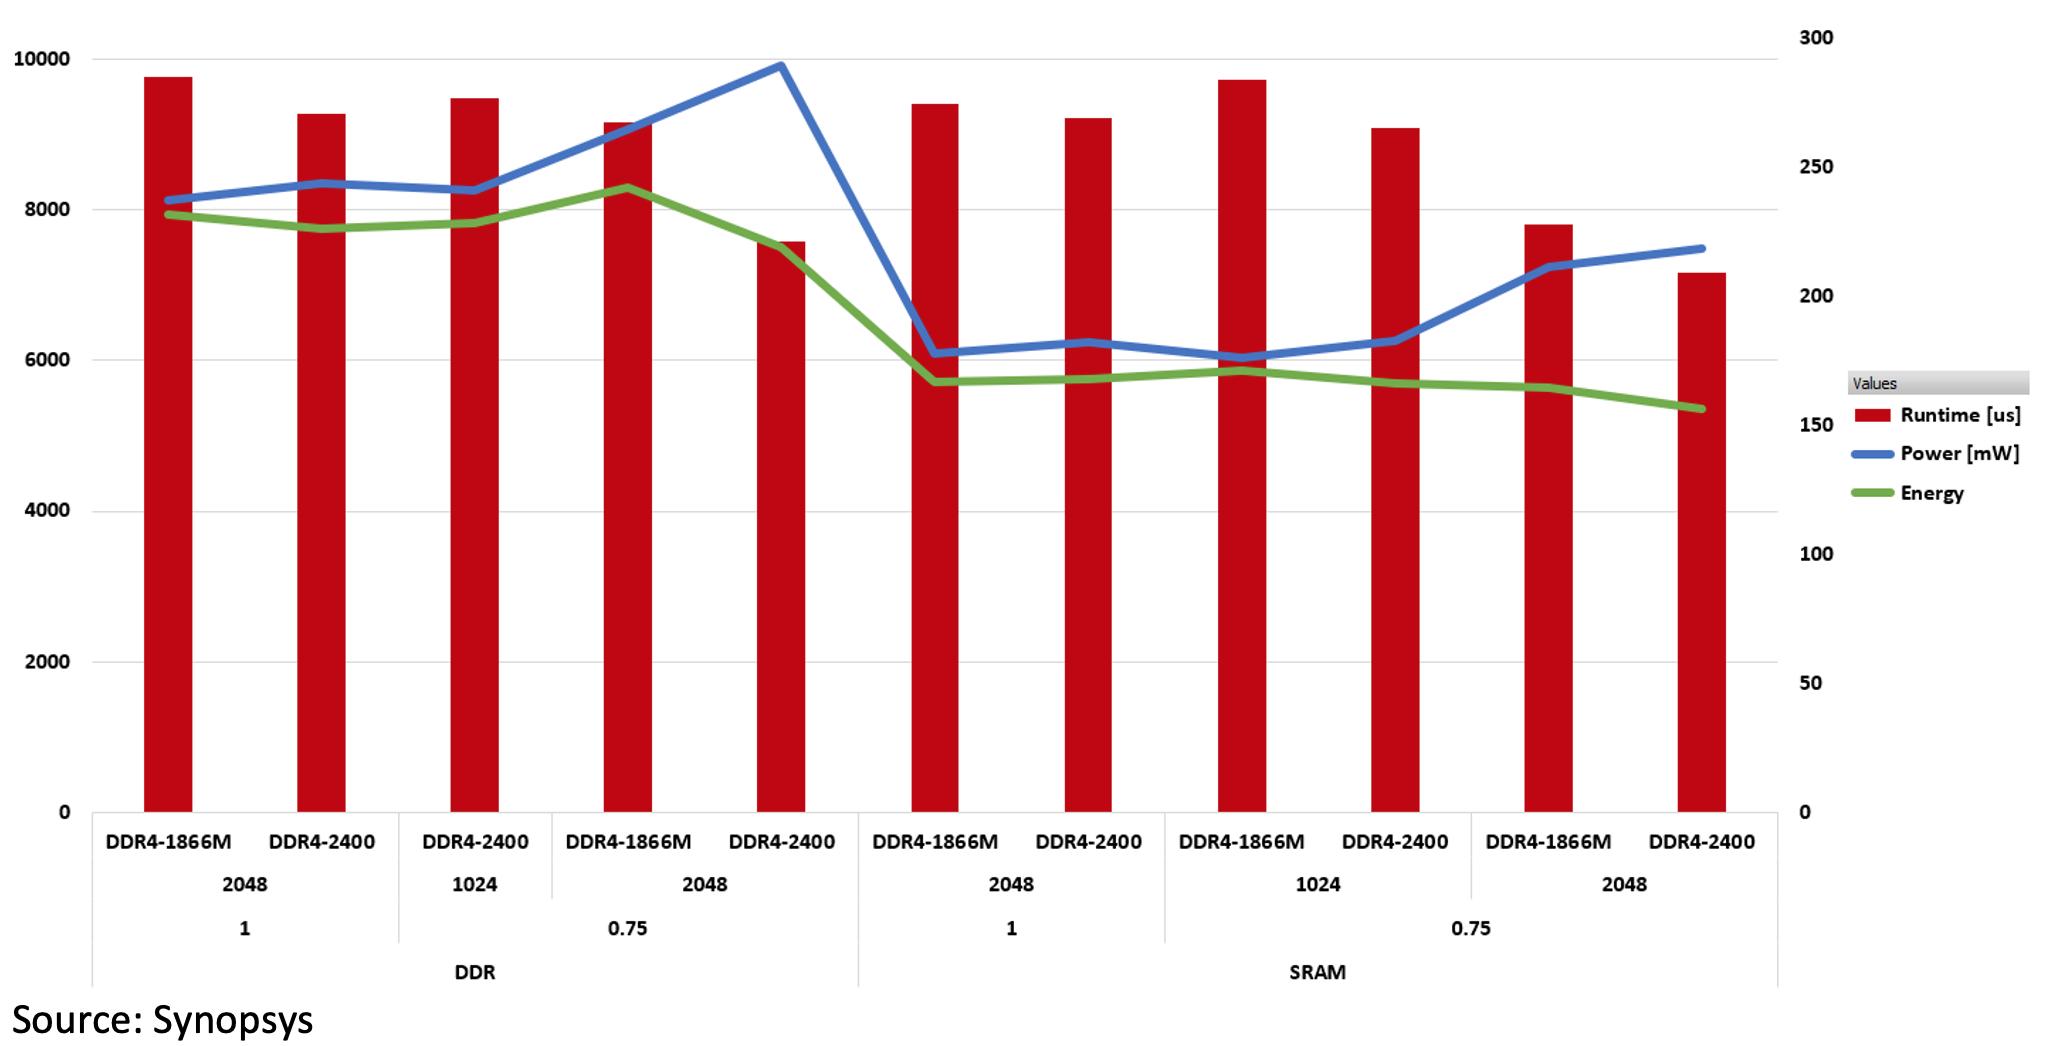 KPI Analysis